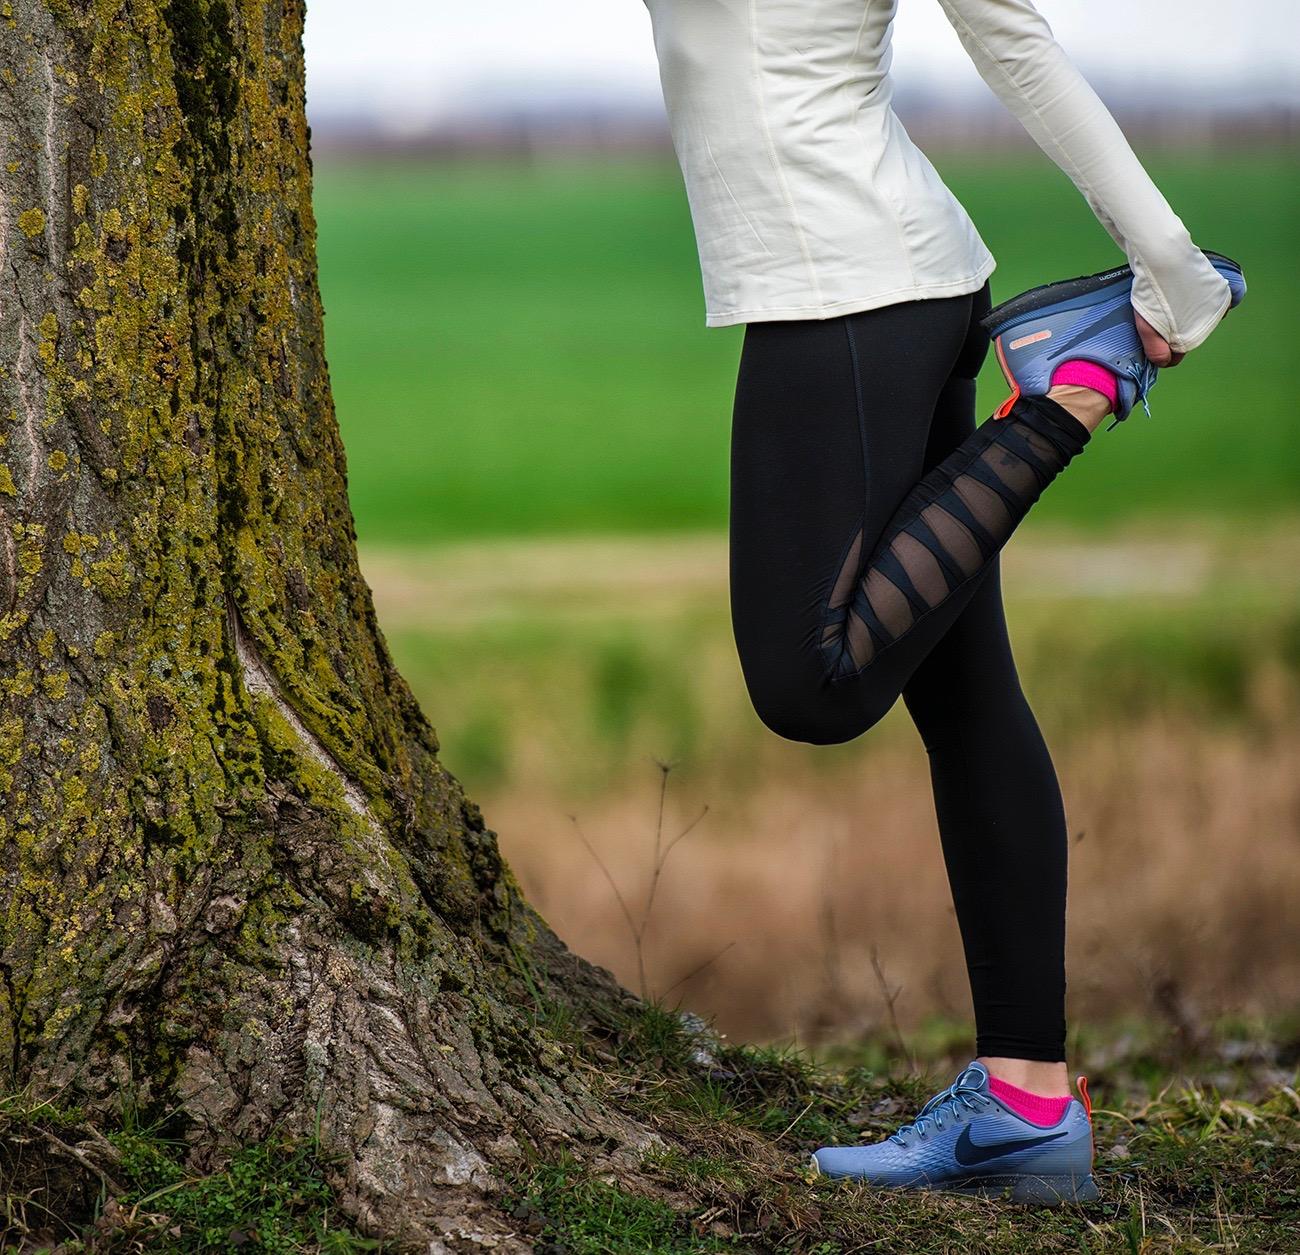 Irene Righetti si allunga - foto di Pierluigi Benini per Running post